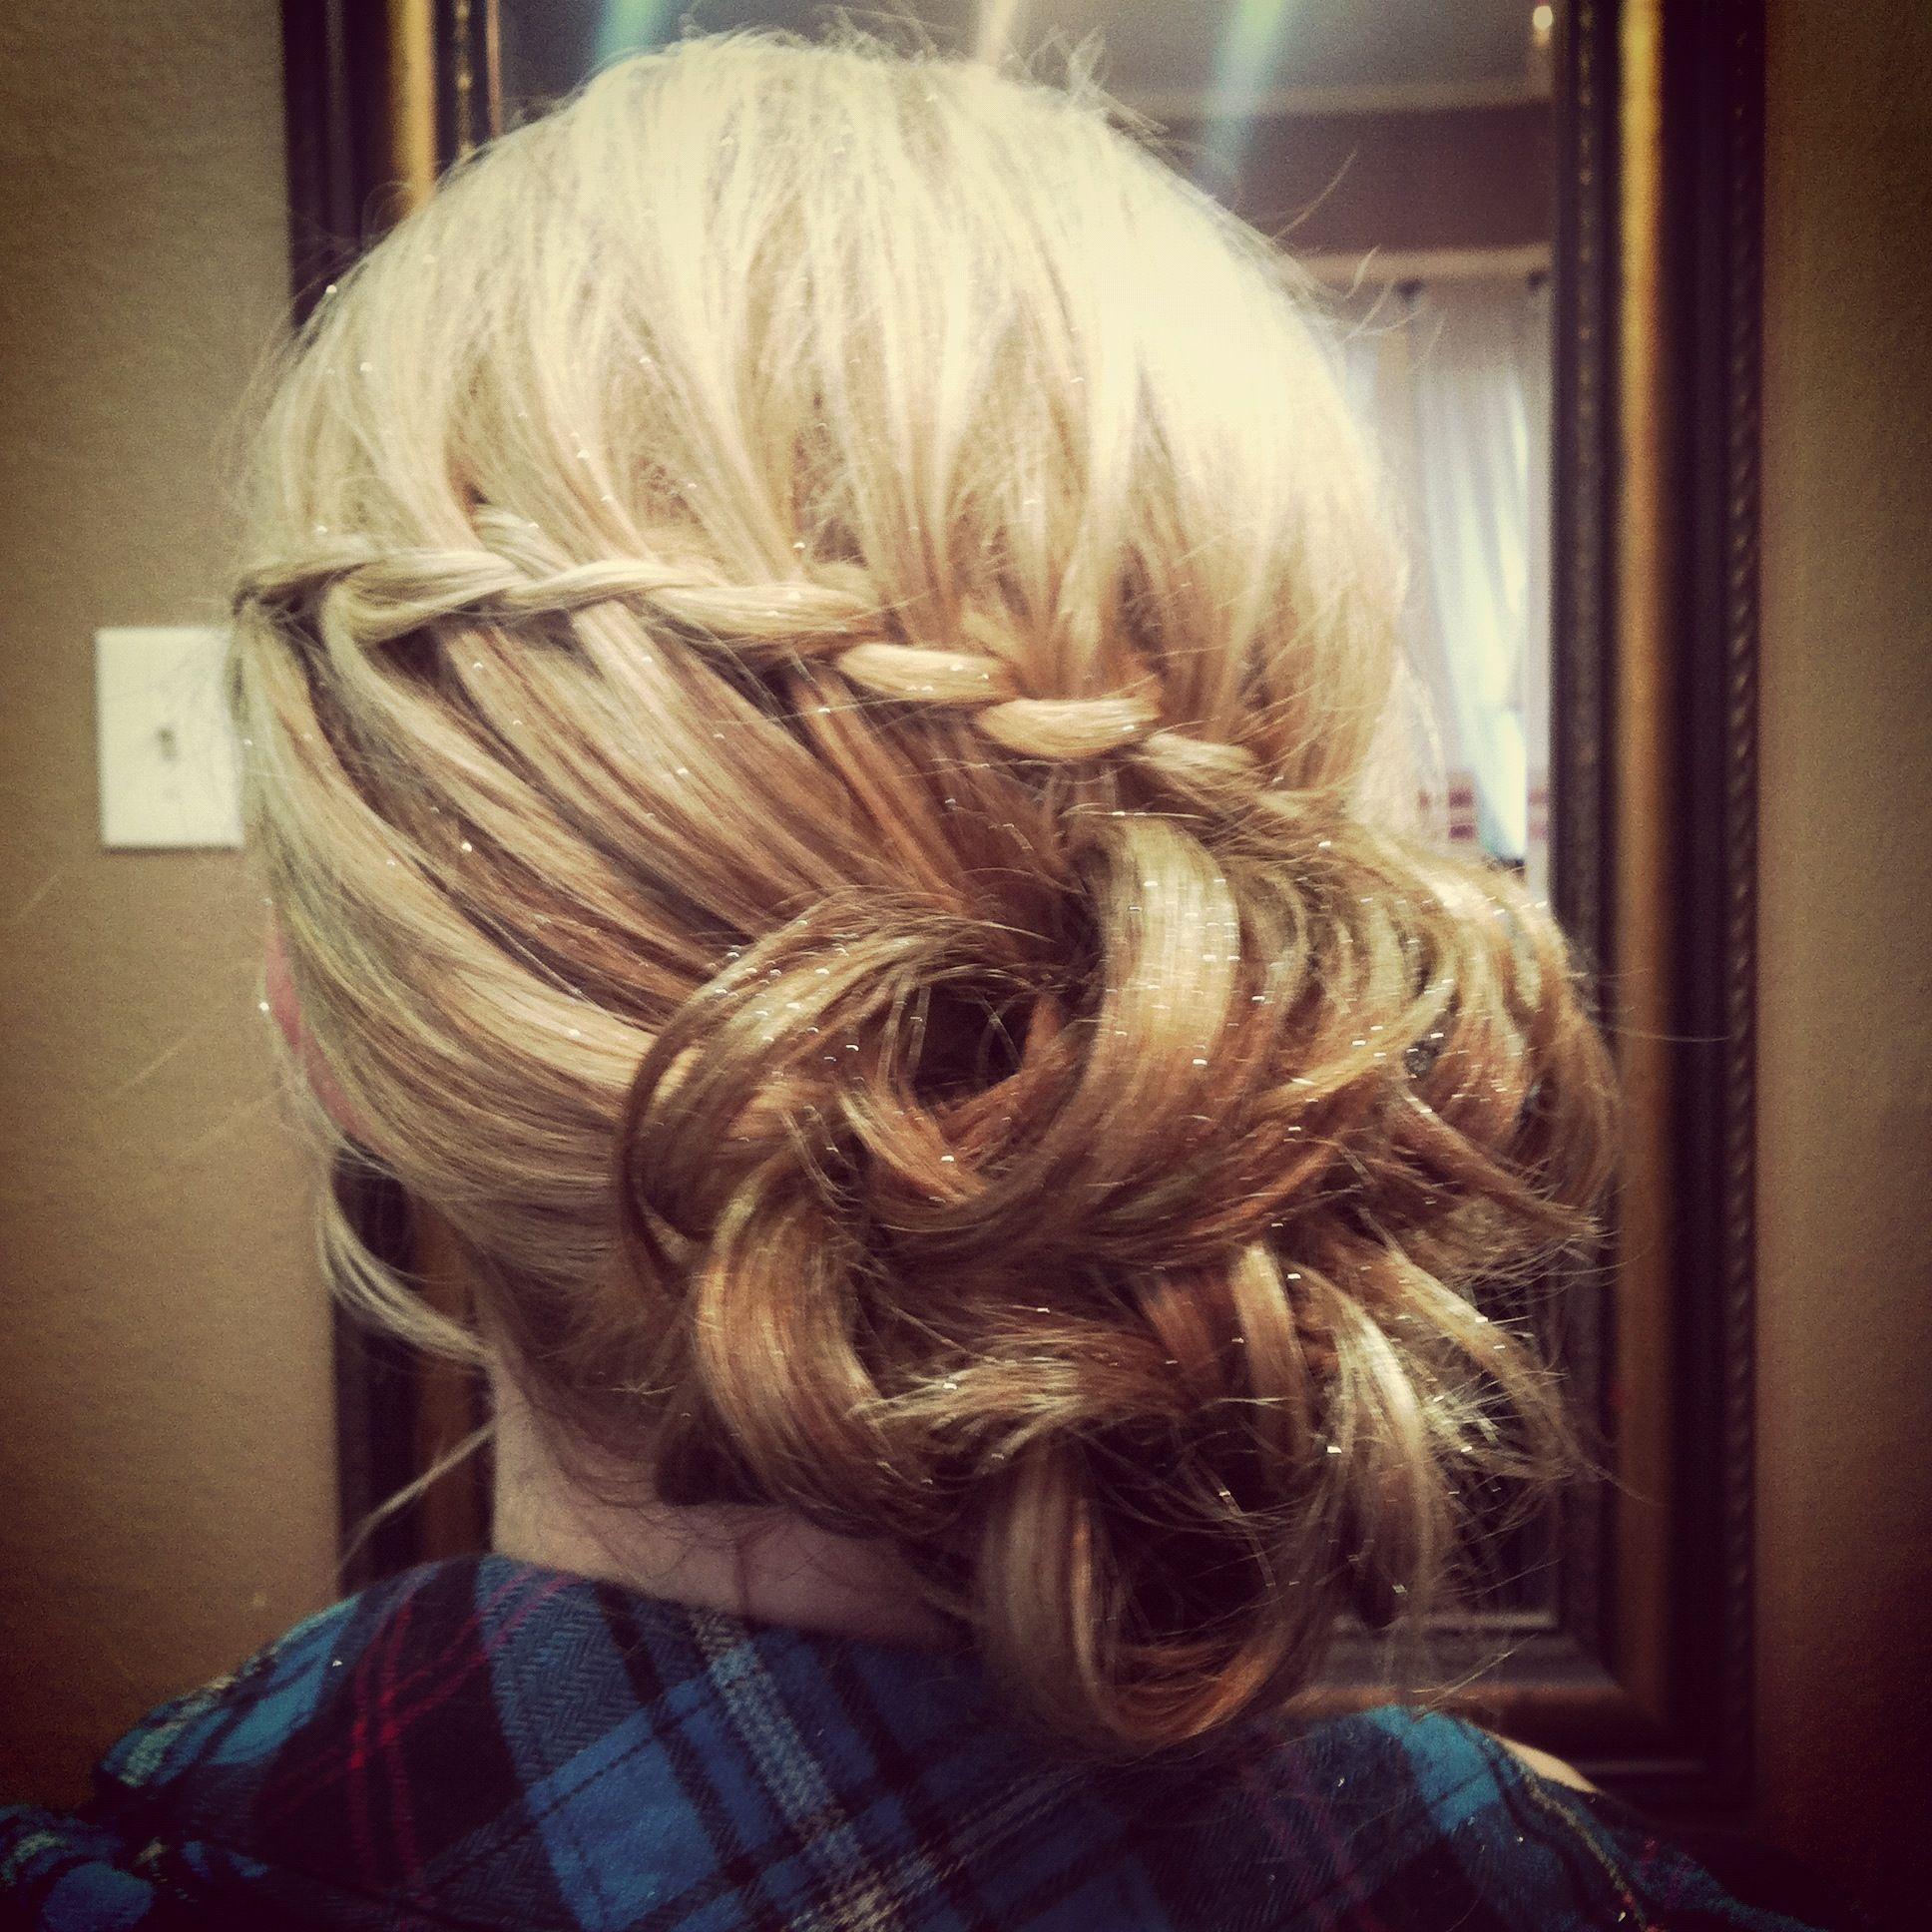 Pin by Sierra Watson on *HAIR* | Side bun hairstyles ...